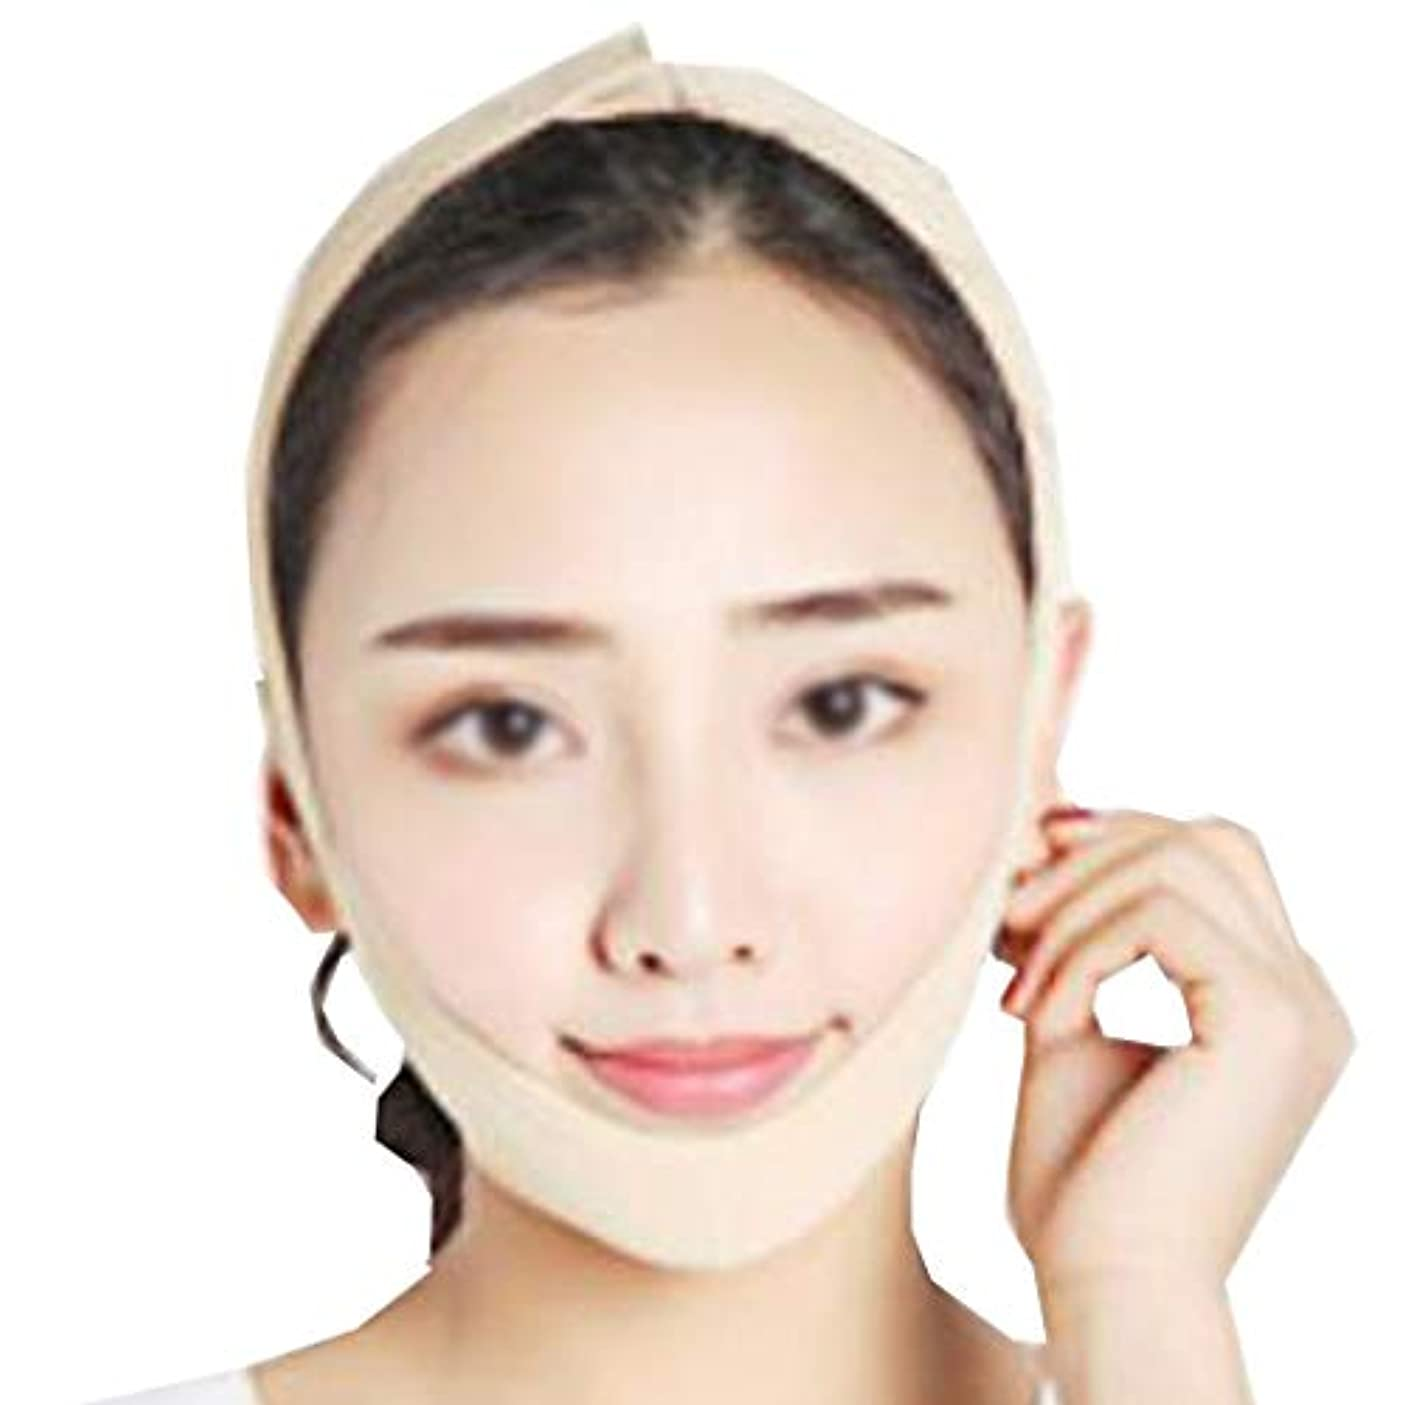 ZWBD フェイスマスク, 細い二重顎の下の小さなVの顔の薄い顔の包帯ライン切り分ける術後の回復マスクの表面持ち上がるヘッドギアの束